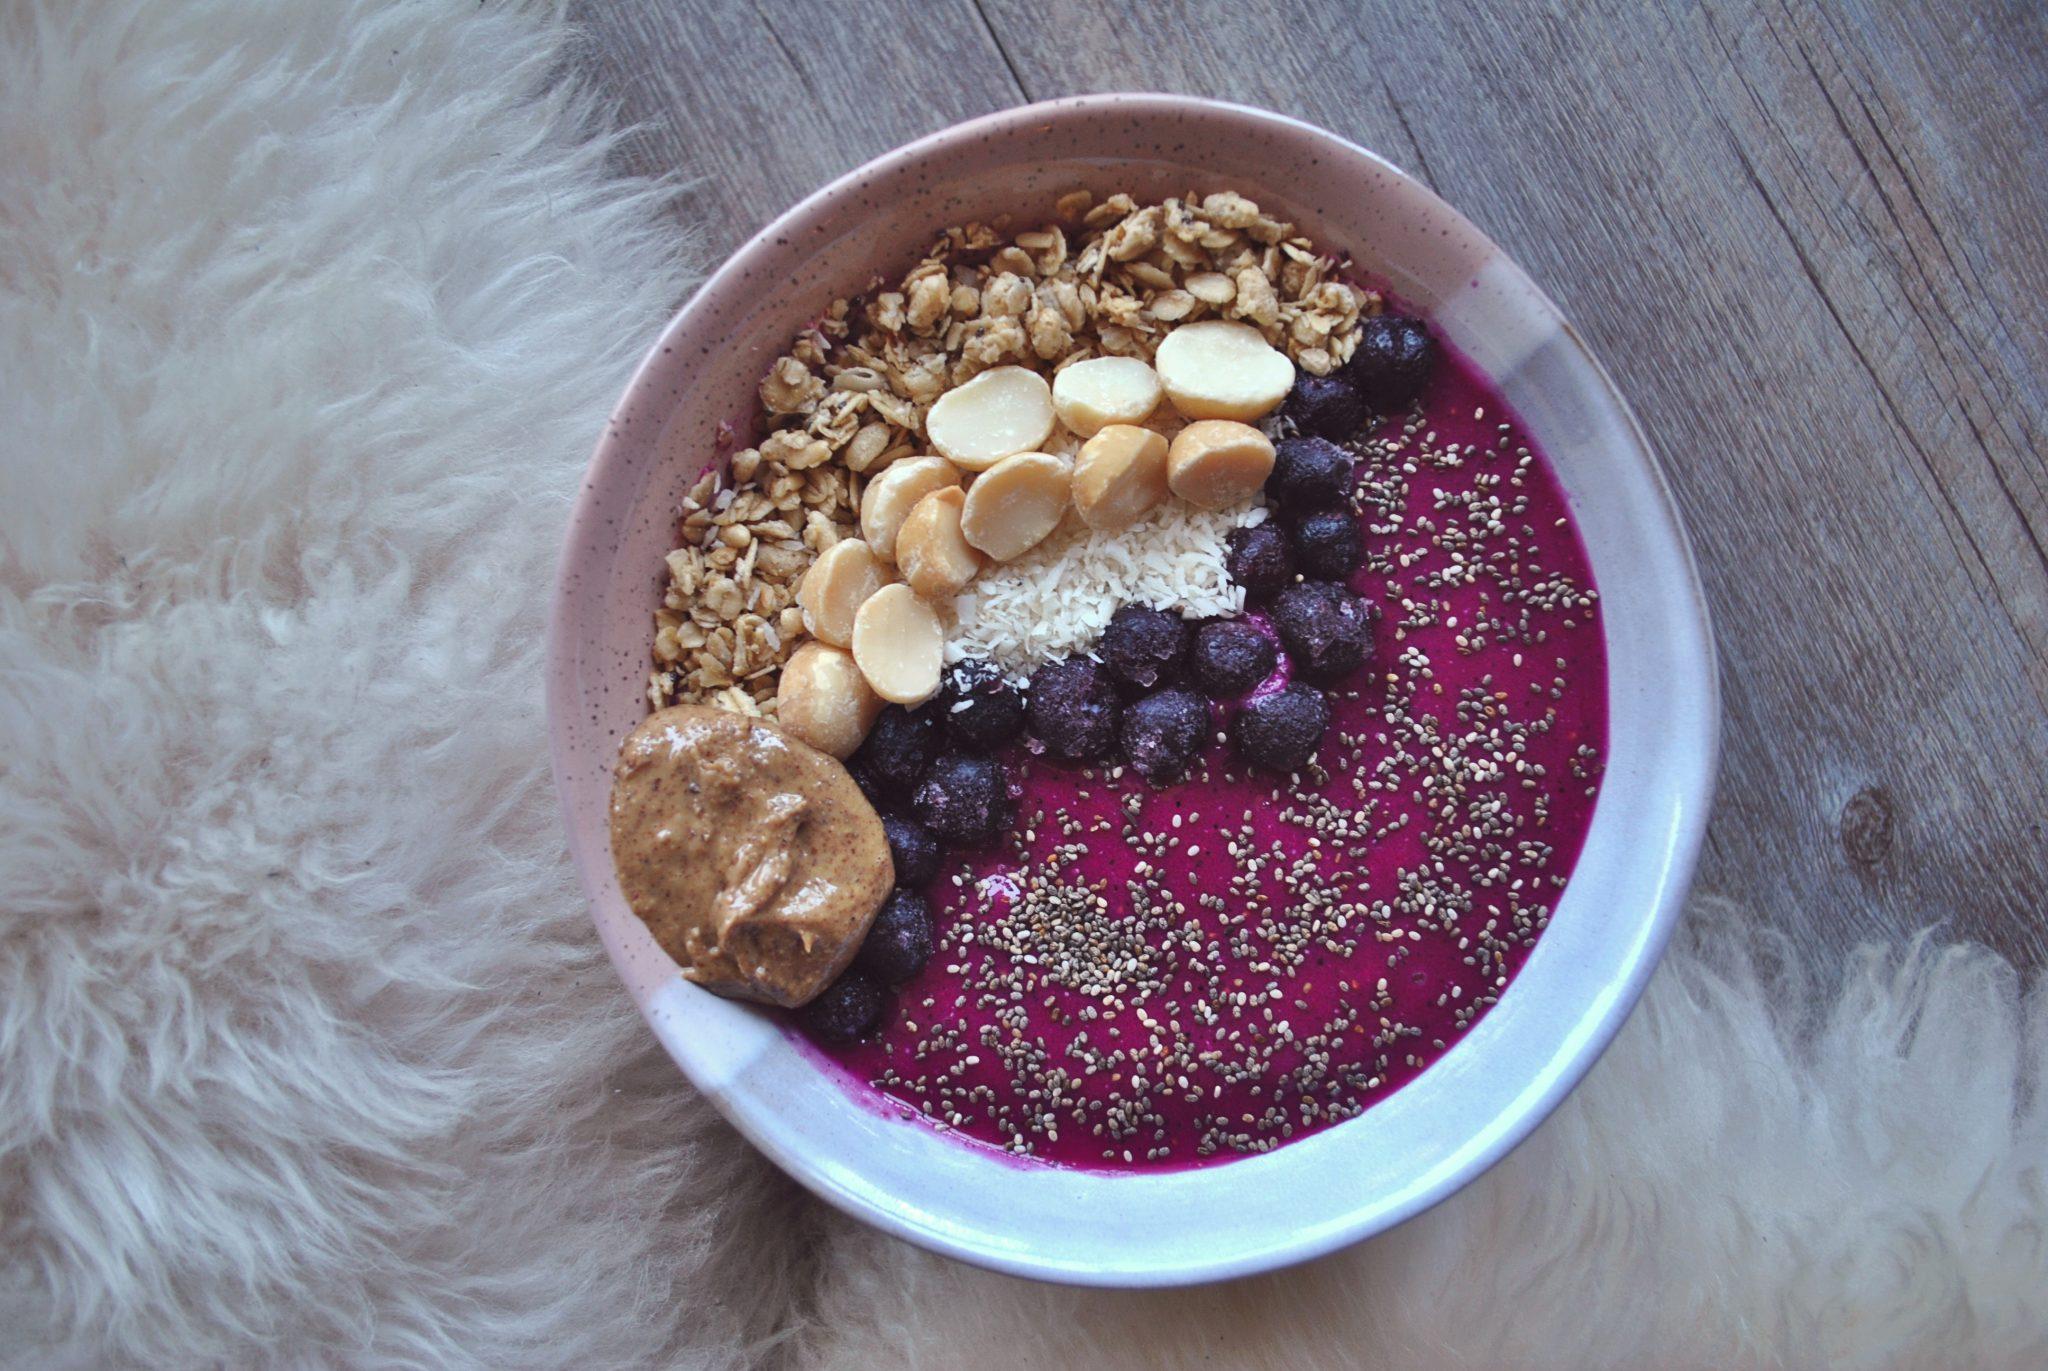 The-Hungarian-Brunette-pitaya-blueberry-bowl.jpg